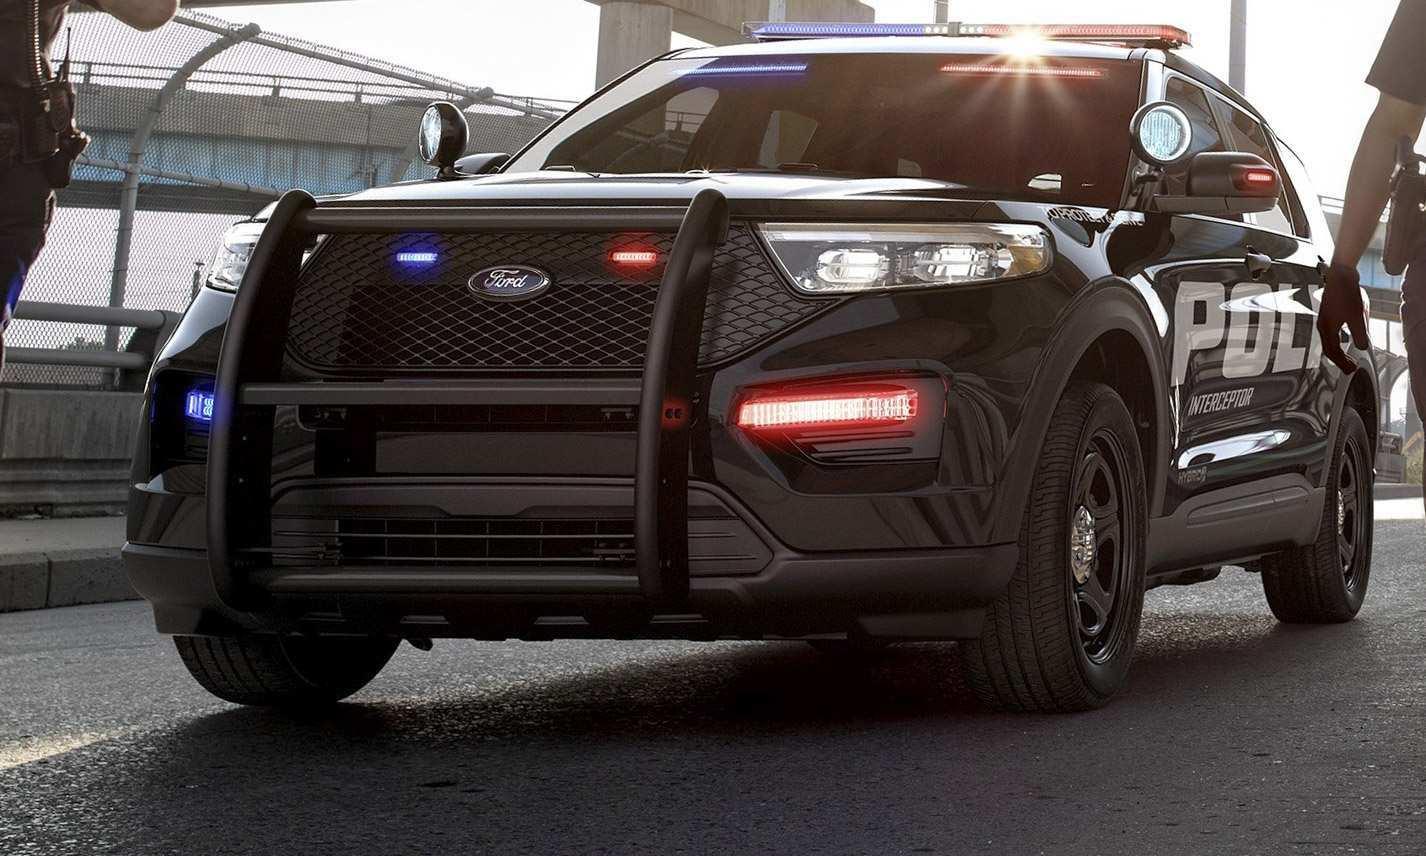 22 Great Ford Interceptor 2020 Concept for Ford Interceptor 2020